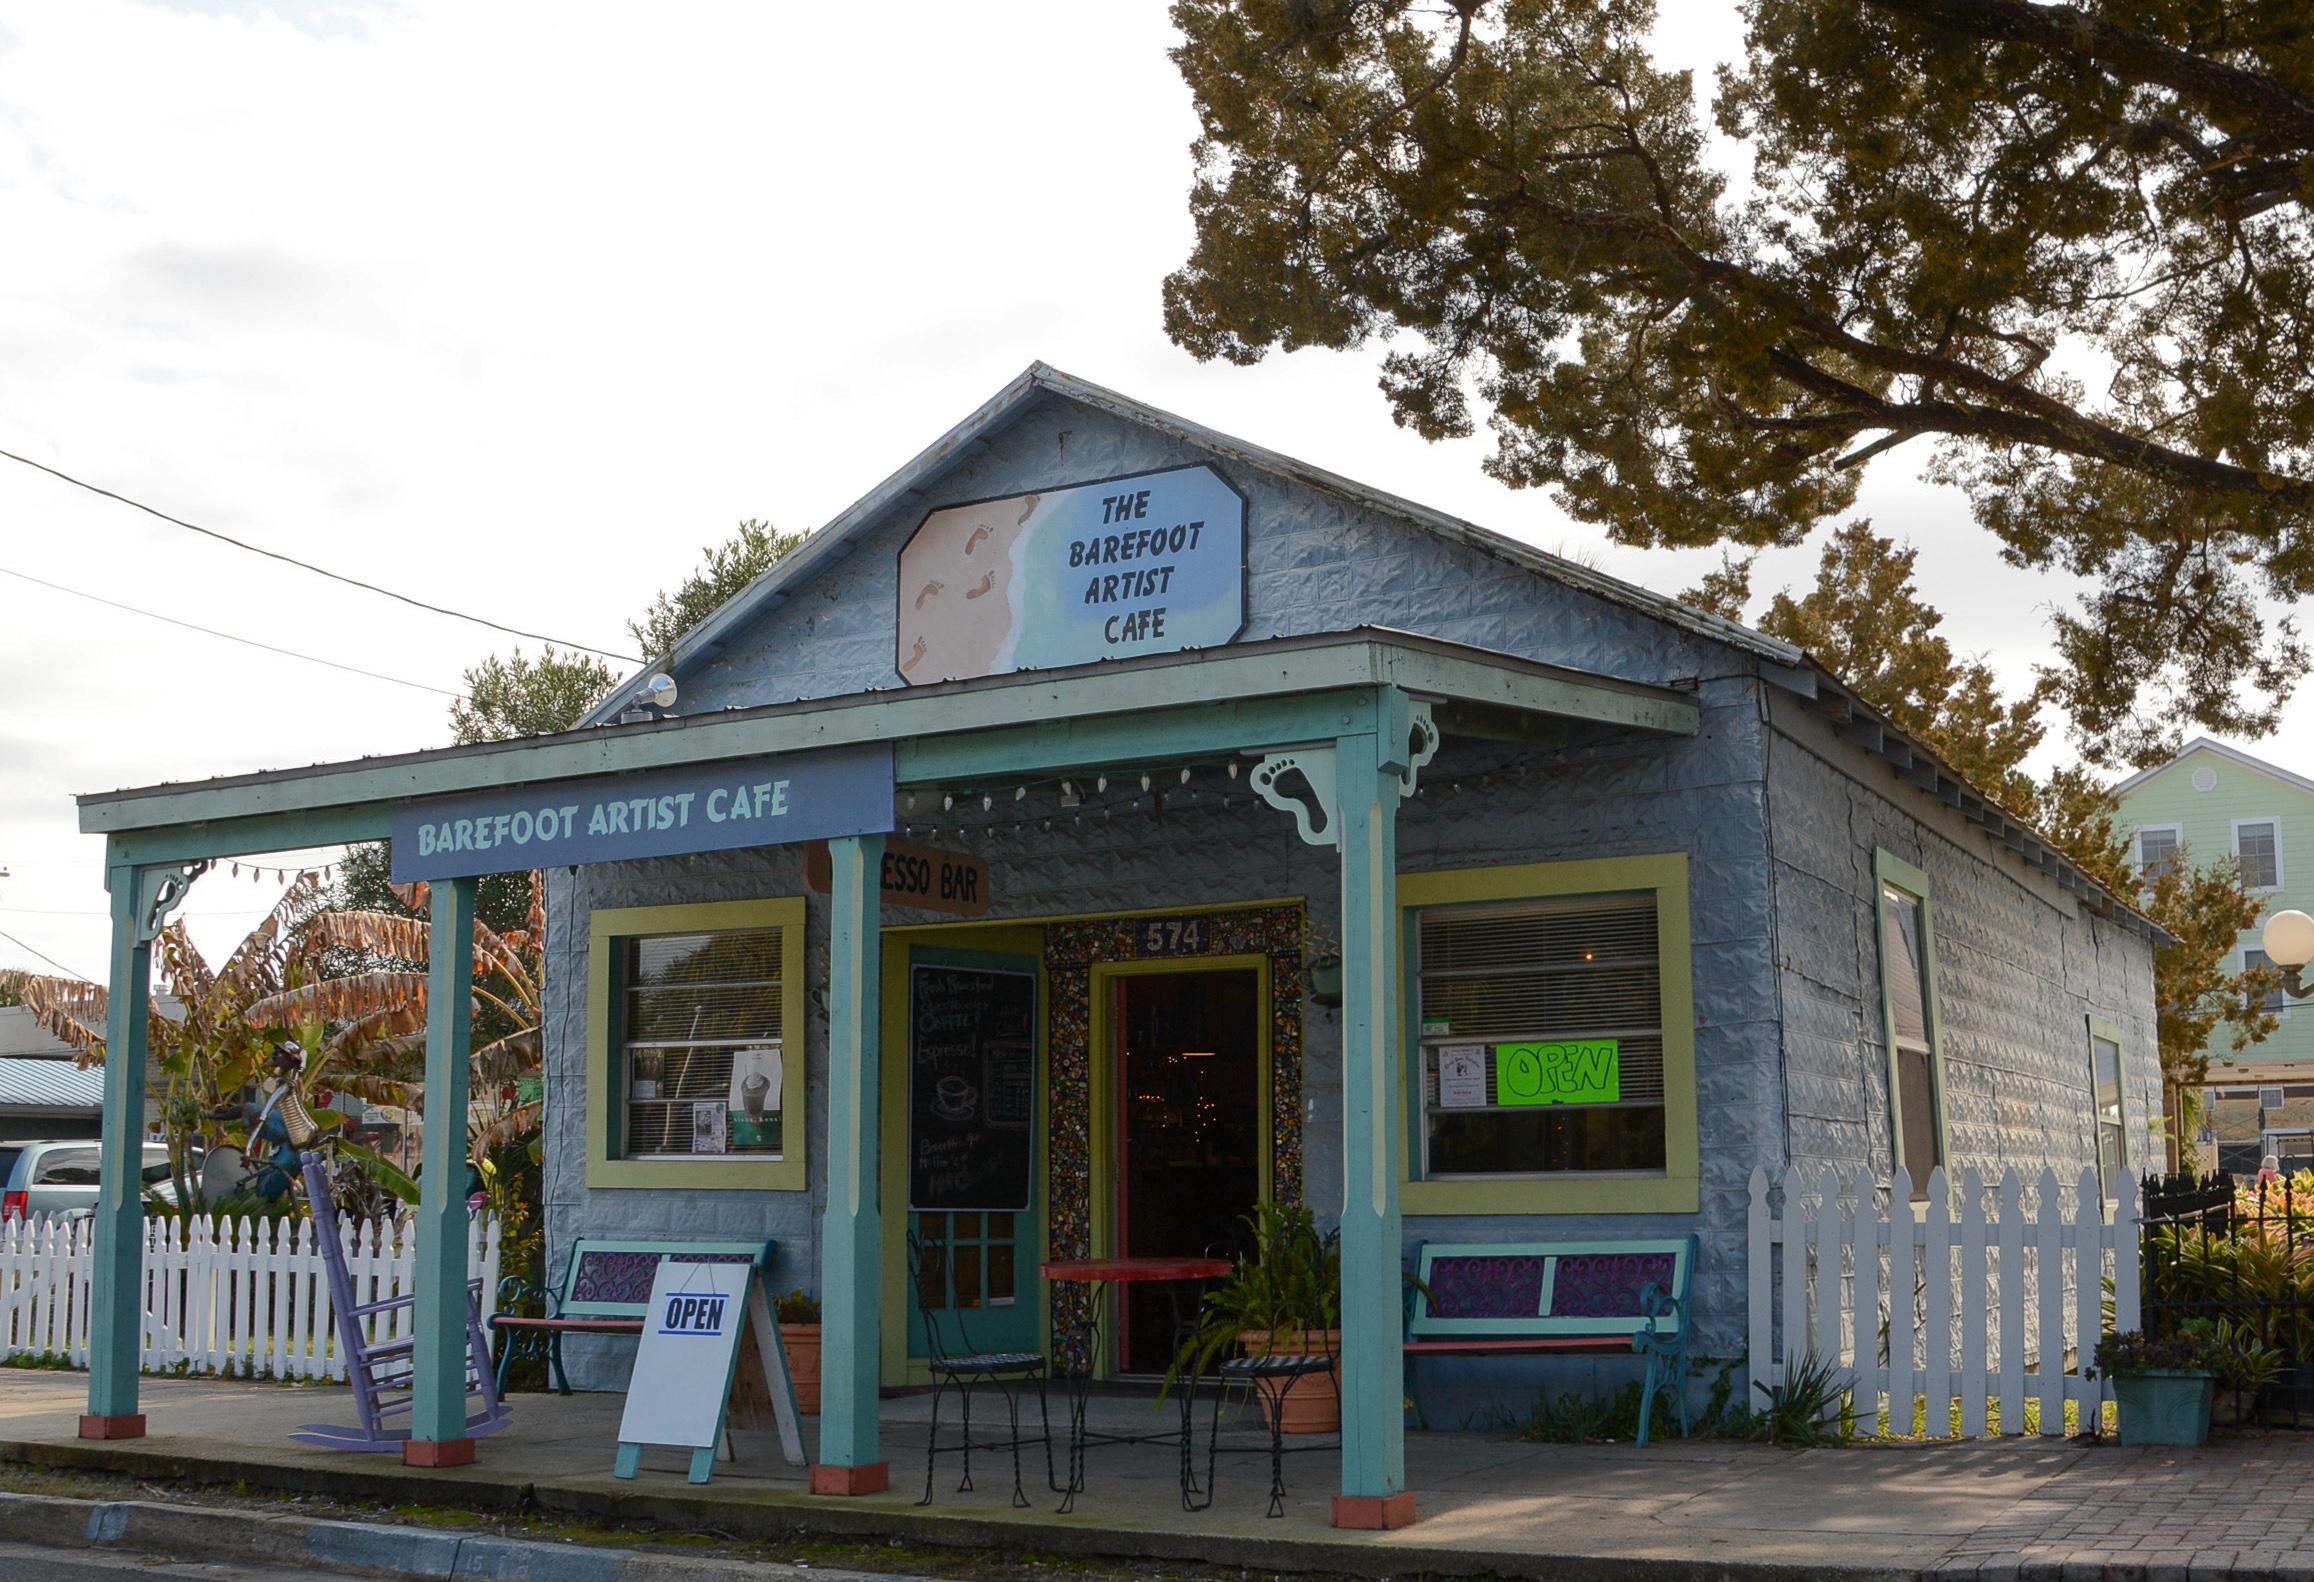 Das Barefoot Artist Café in Florida